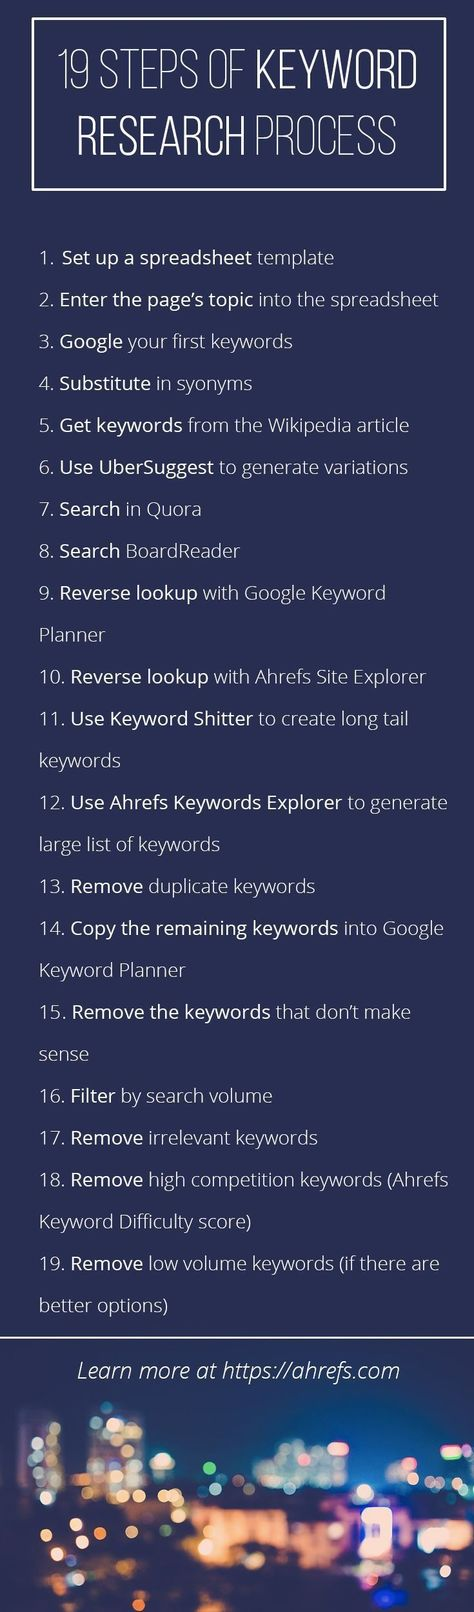 Keyword Research: The Beginner's Guide by Ahrefs   Seo marketing, Internet marketing, Digital marketing